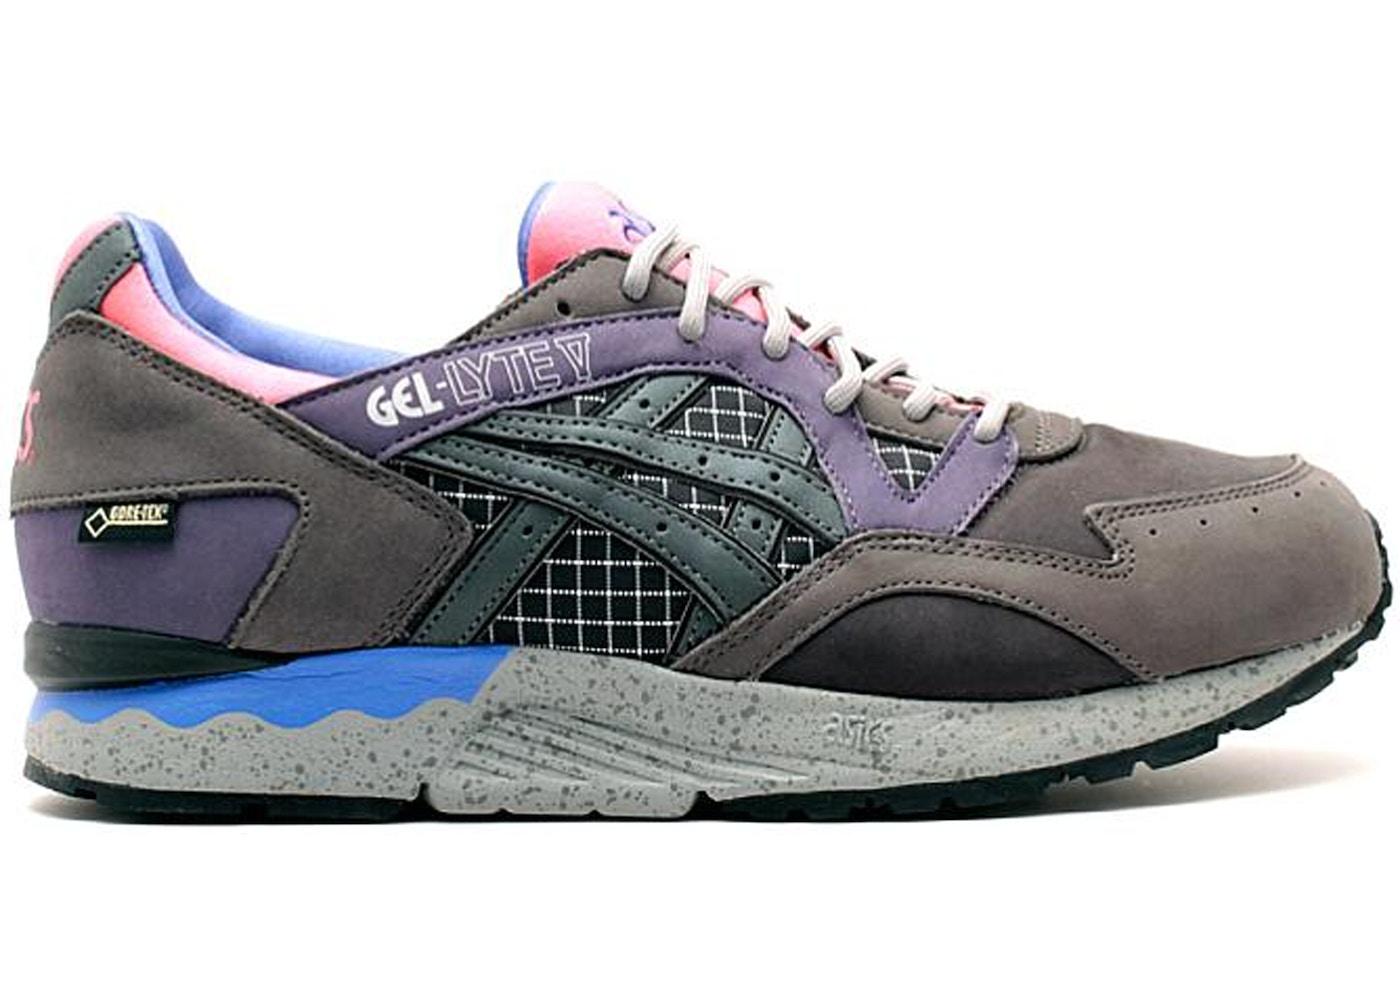 ASICS Gel-Lyte V Packer Shoes x Gore-tex Charcoal